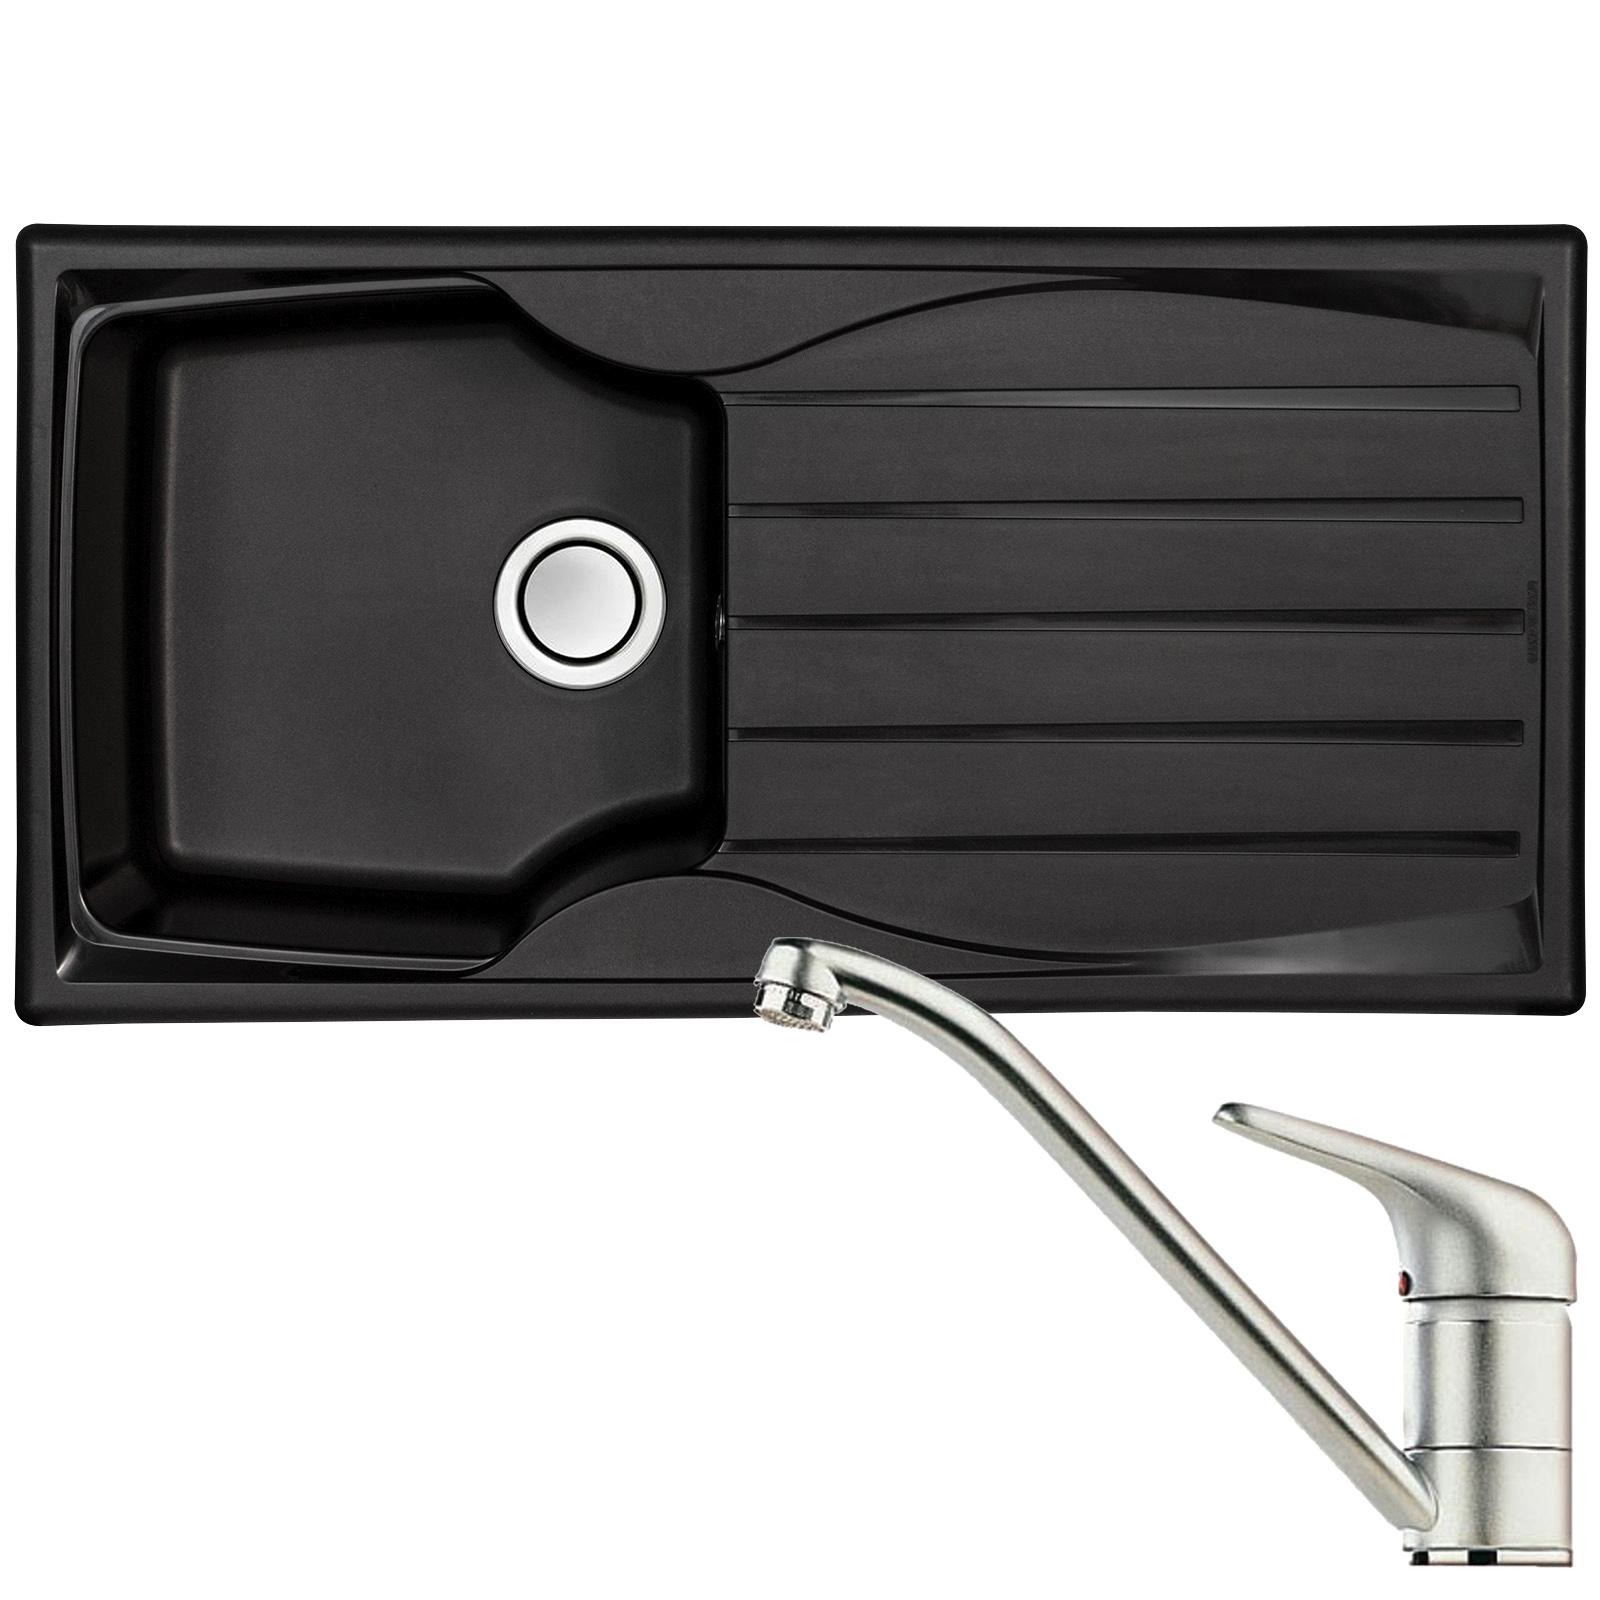 Astracast sierra 1 0 bowl black kitchen sink clearwater creta chrome mixer tap at ship it appliances